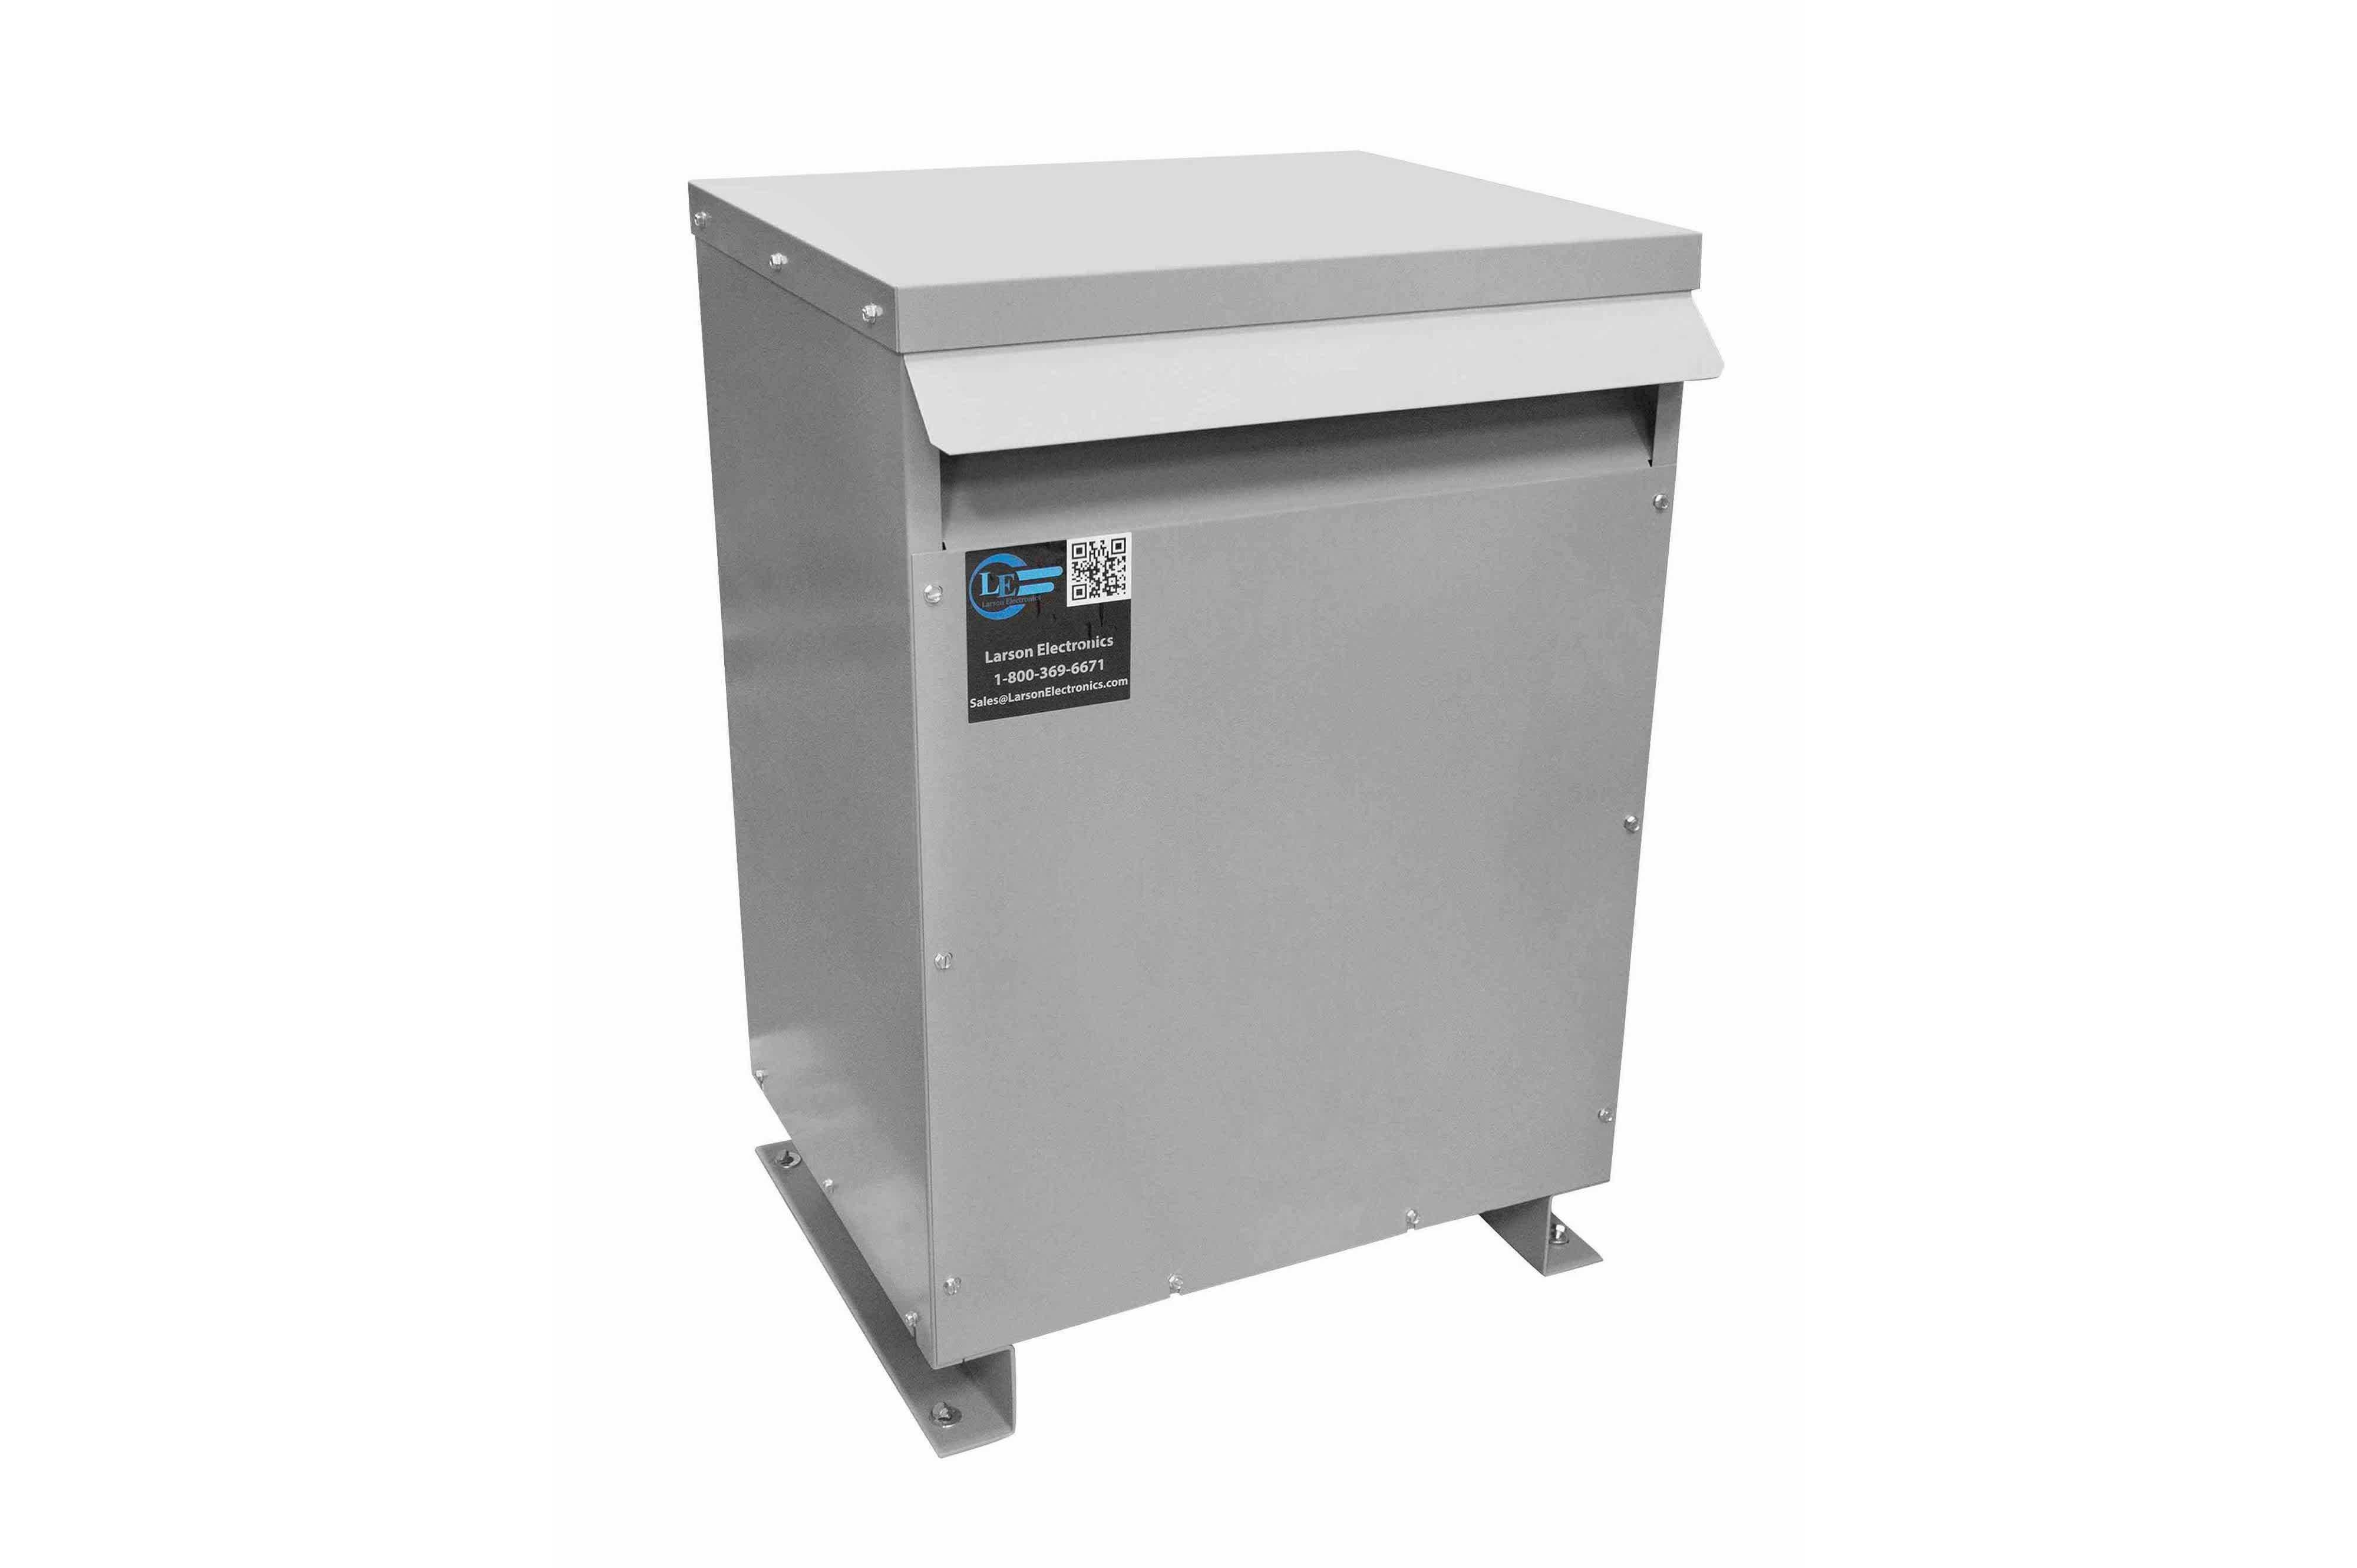 500 kVA 3PH Isolation Transformer, 415V Wye Primary, 240V Delta Secondary, N3R, Ventilated, 60 Hz